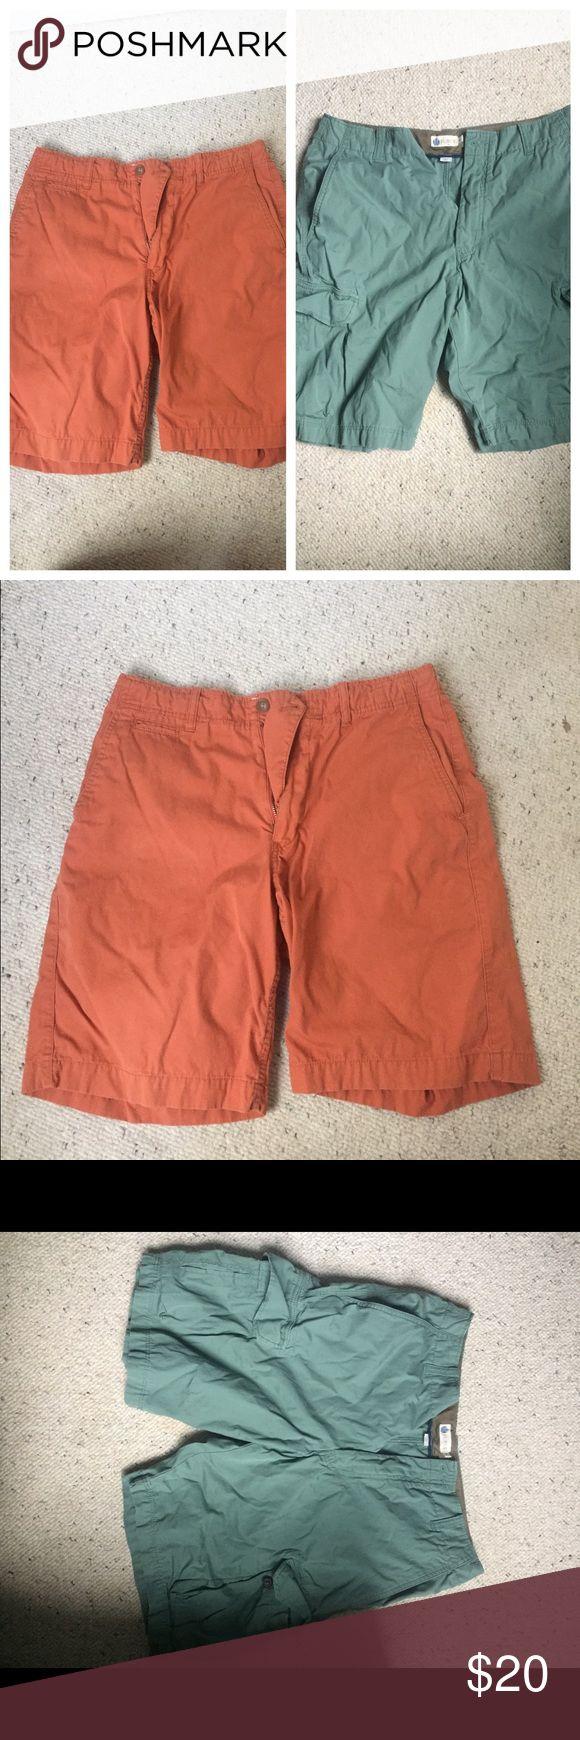 J.Crew Men's Shorts Pack! NWOT! Size 32 J.Crew Men's Shorts Pack! NWOT! Size 32 - great for stocking up for summer! J. Crew Shorts Flat Front